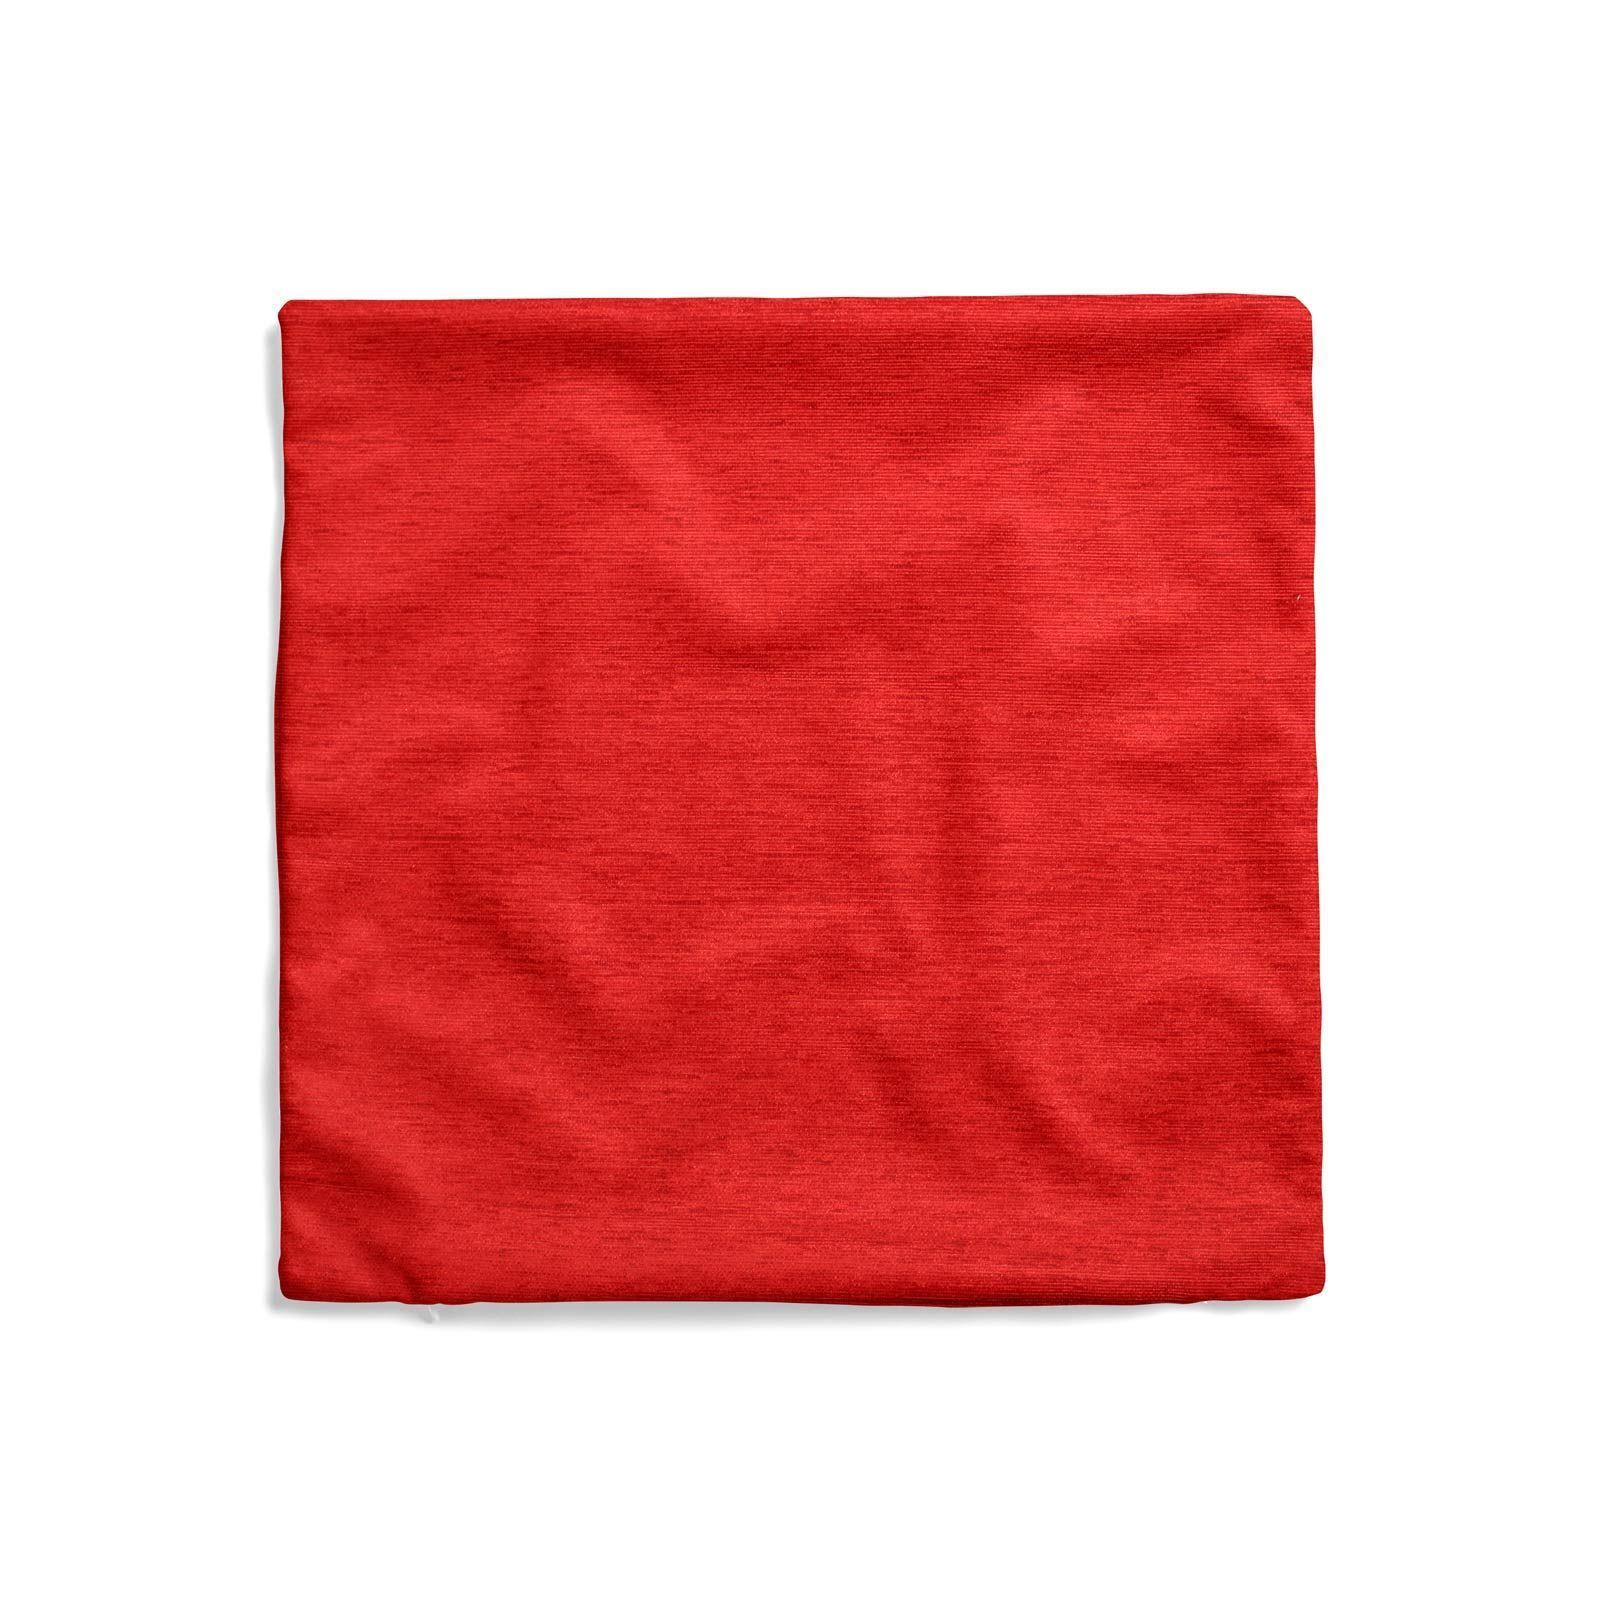 Vino-Tinto-Cushion-Covers-Coleccion-17-034-18-034-43cm-45cm-Cubierta miniatura 4